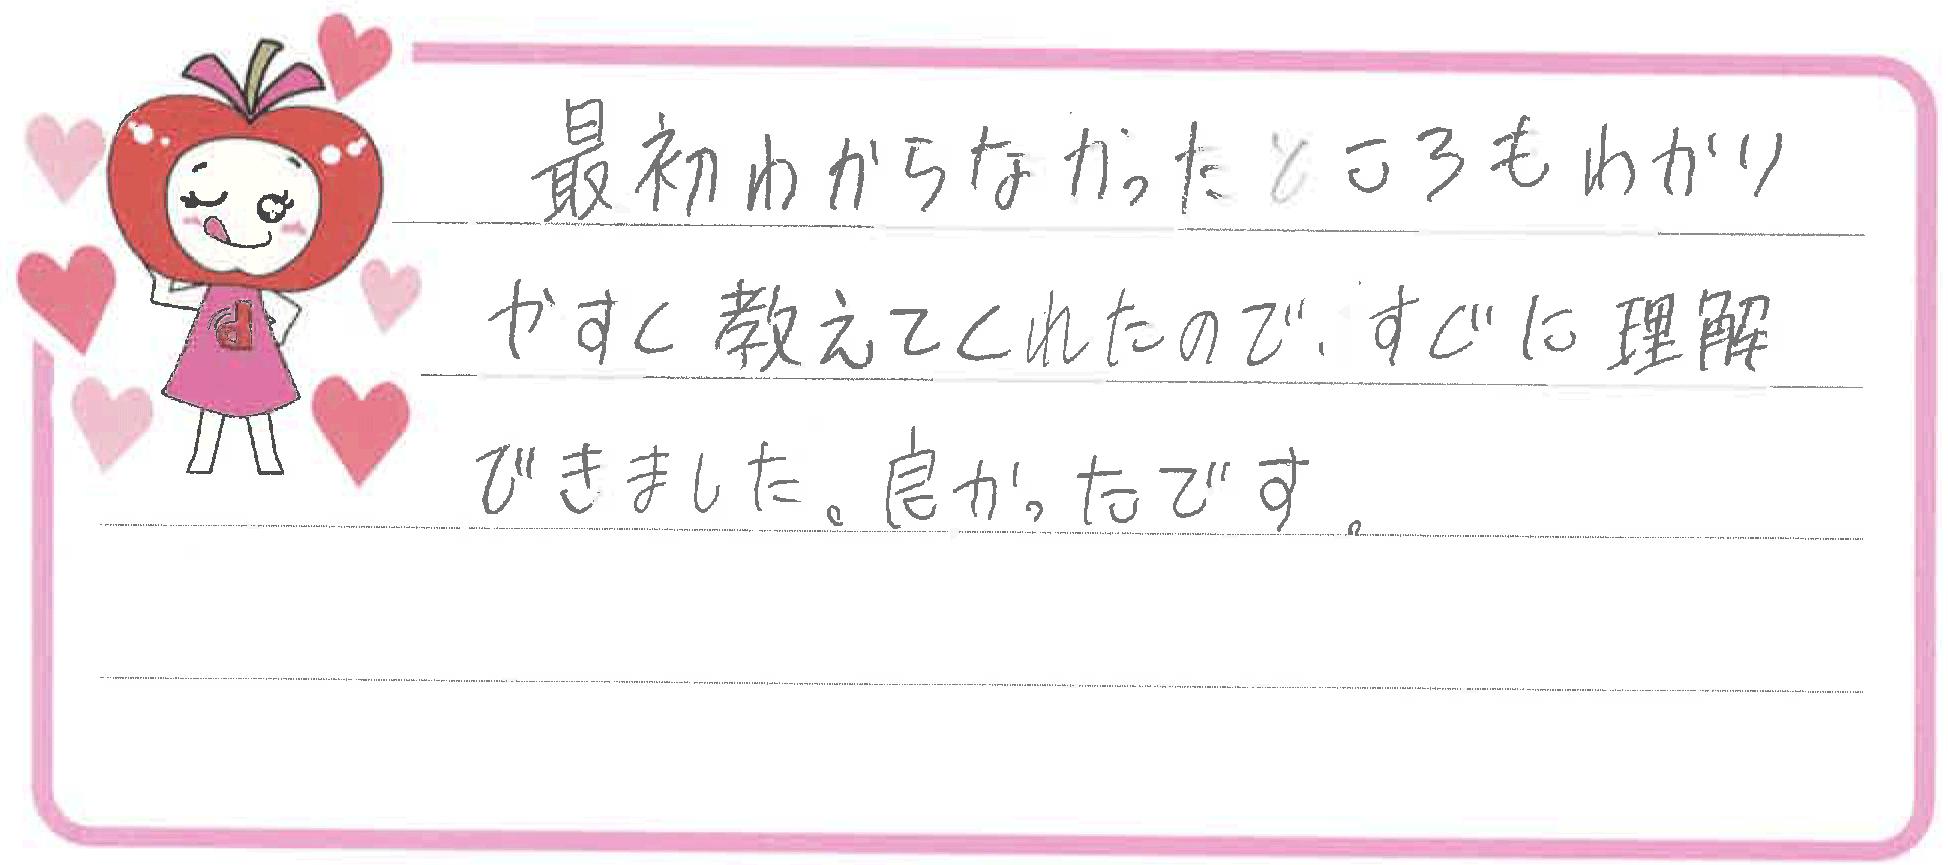 Aちゃん(松阪市)からの口コミ